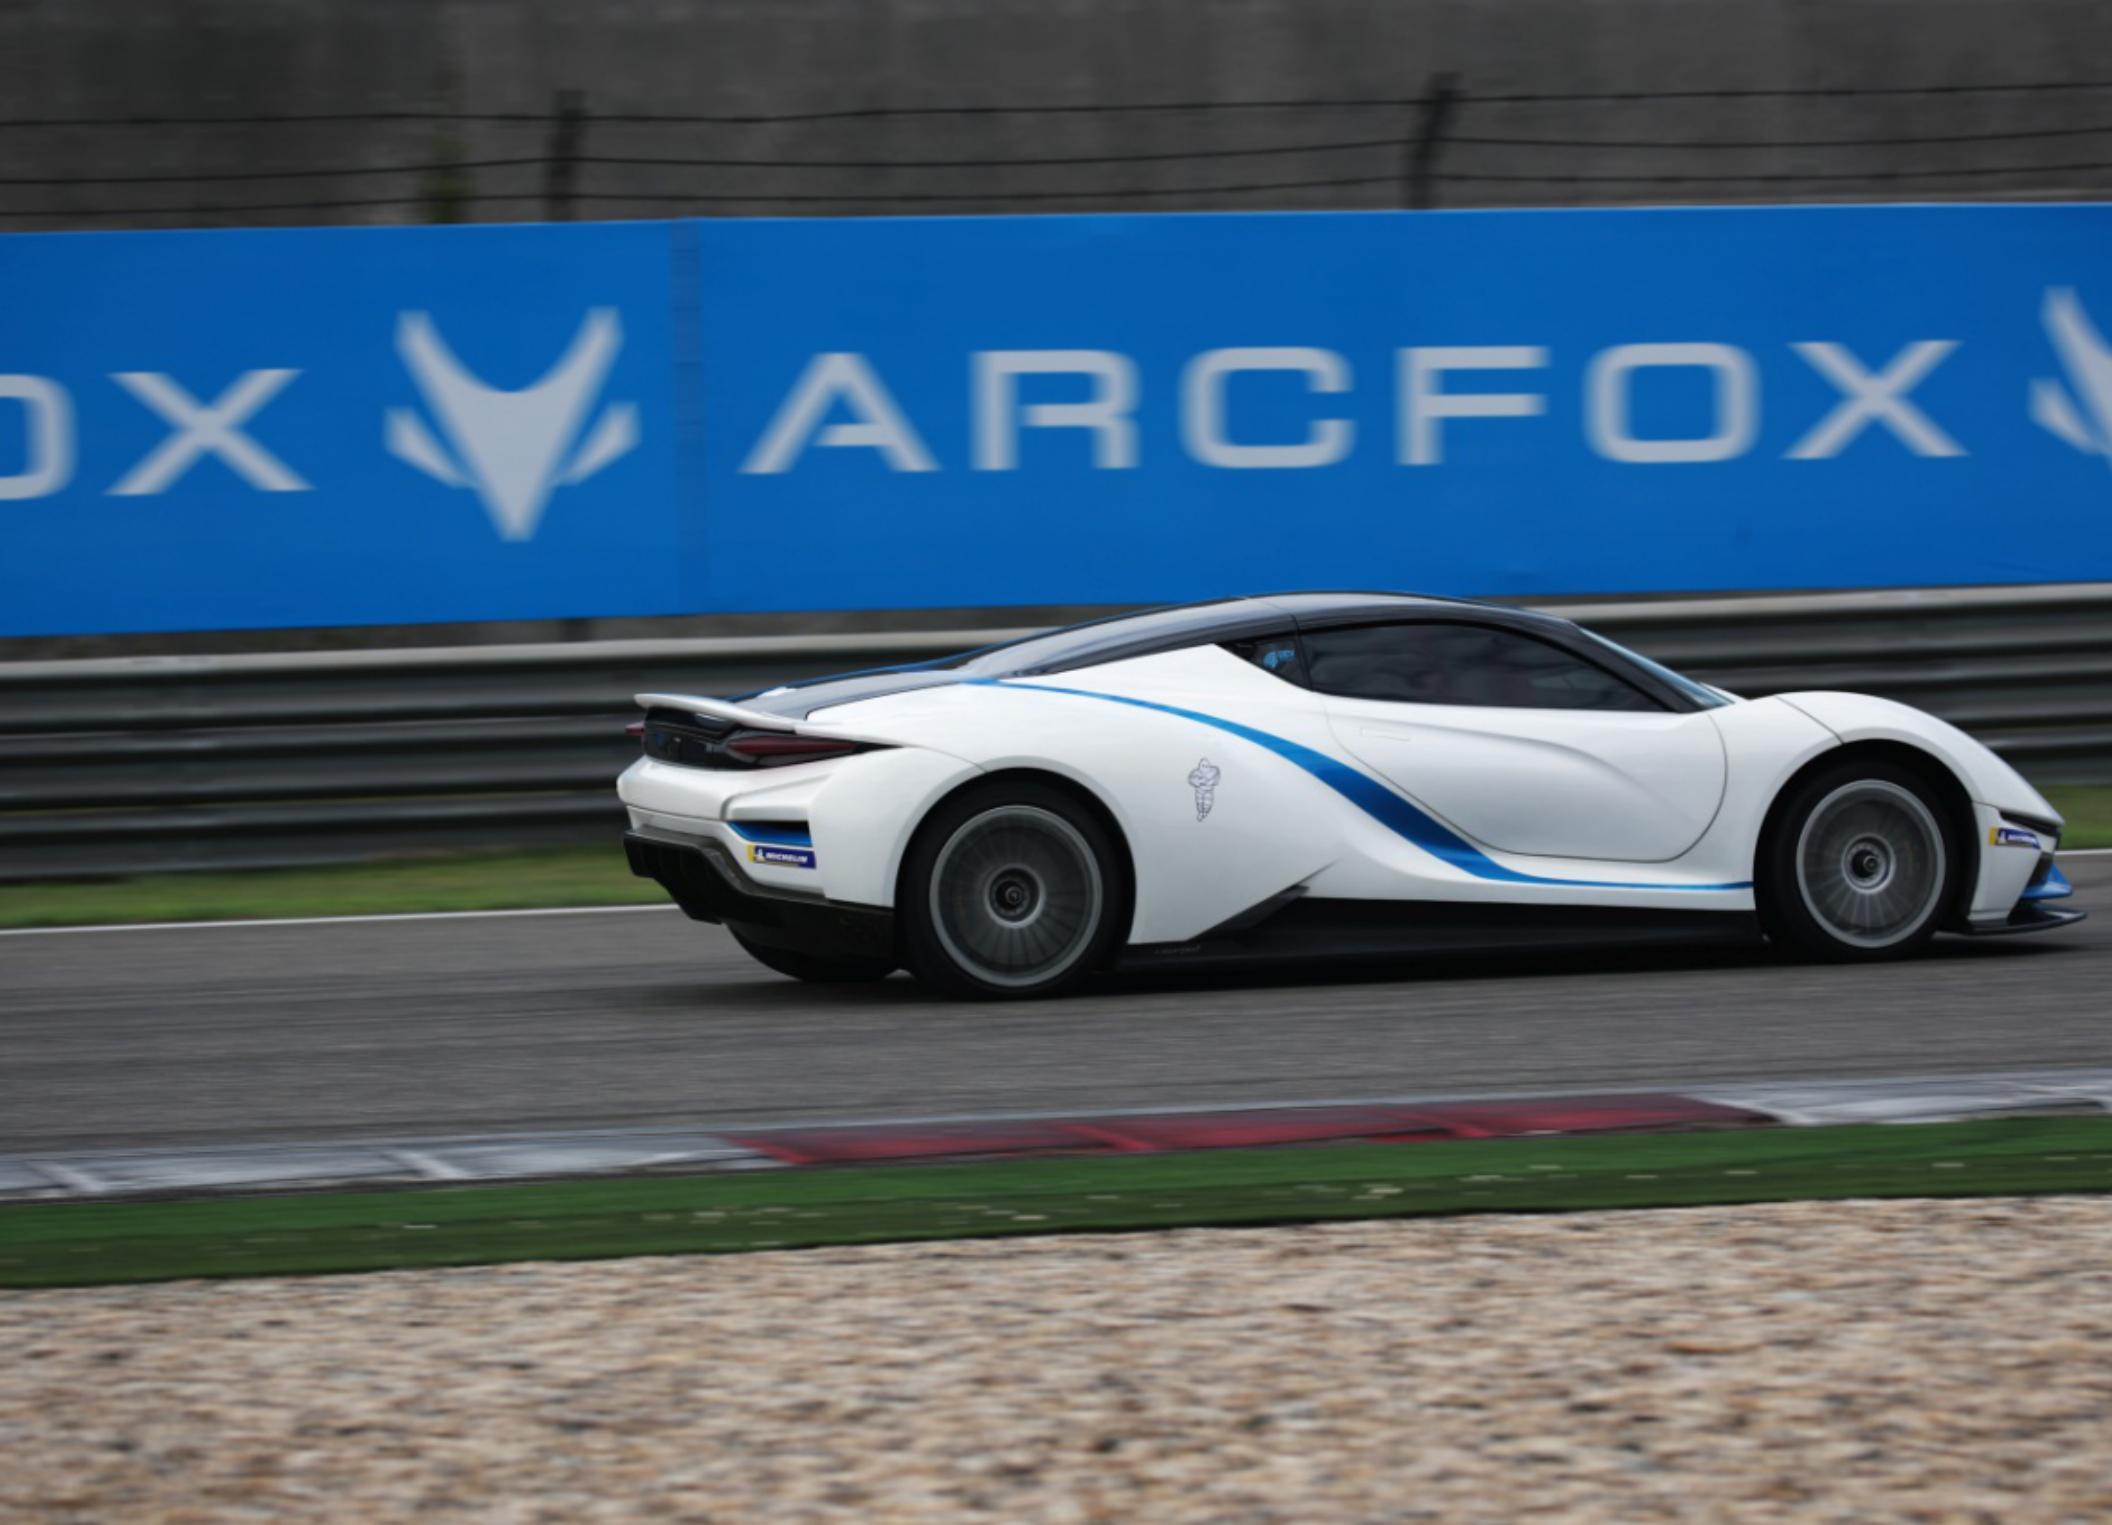 【china-gt综述稿】全程领航顶级赛事,arcfox加速品牌向上v21038.jpg